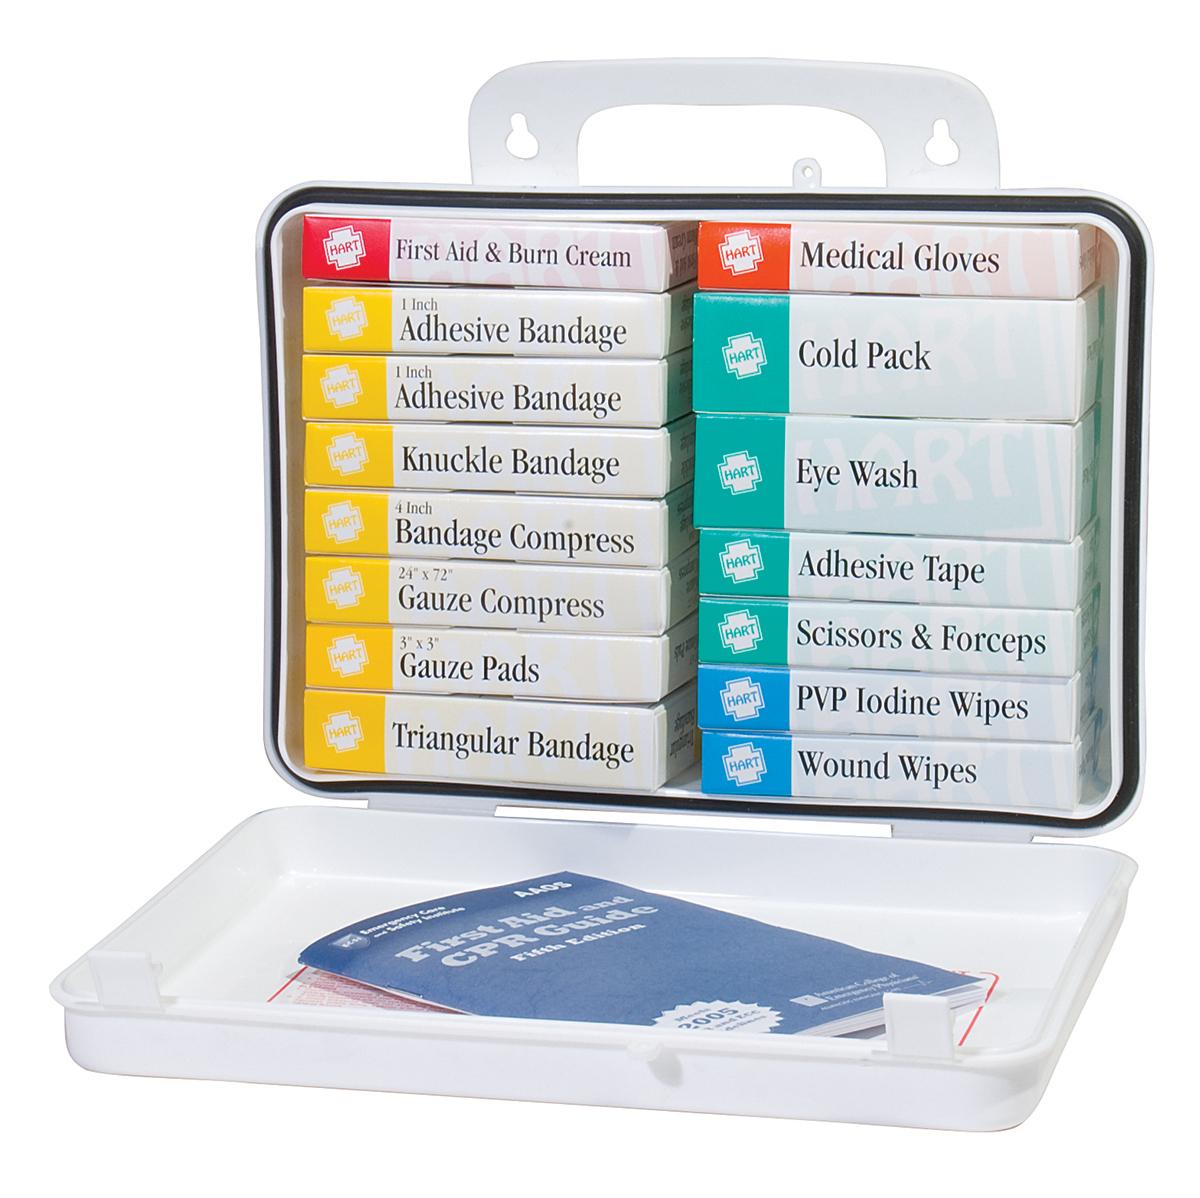 16 Unit First Aid Kit, OSHA, HART, poly - FIRST AID KITS